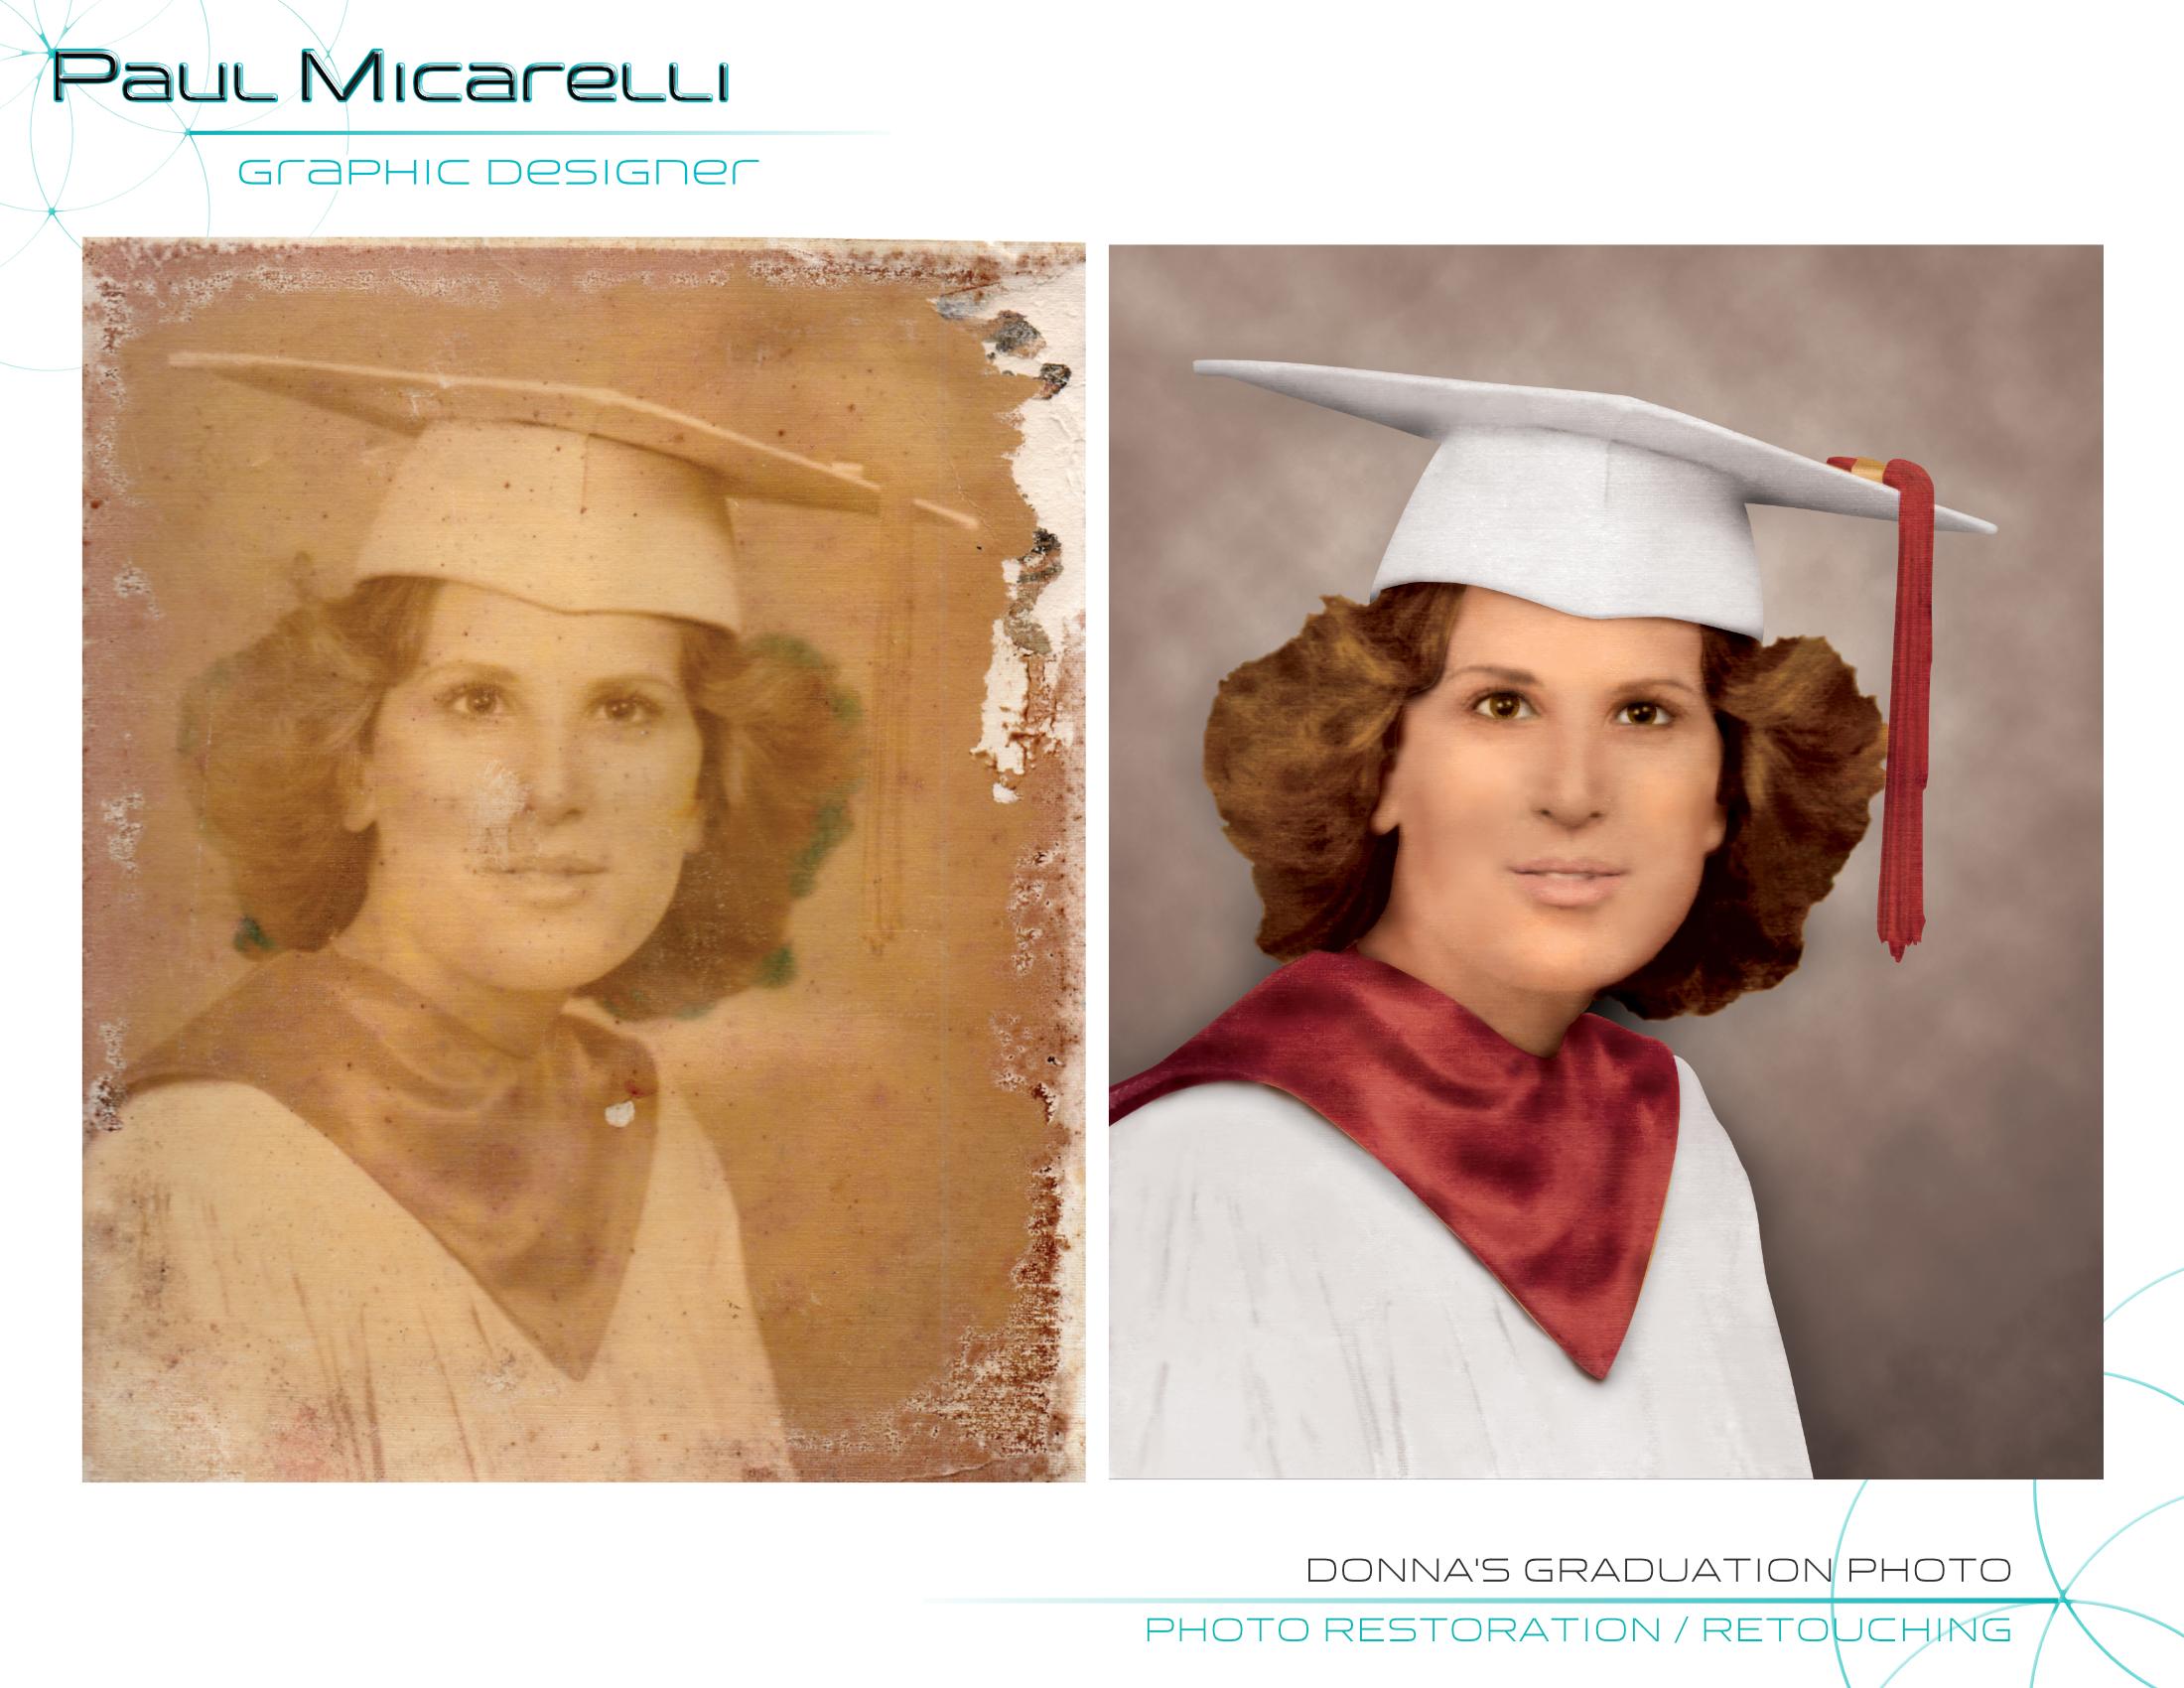 Paul-Micarelli-Donna Graduation Photo